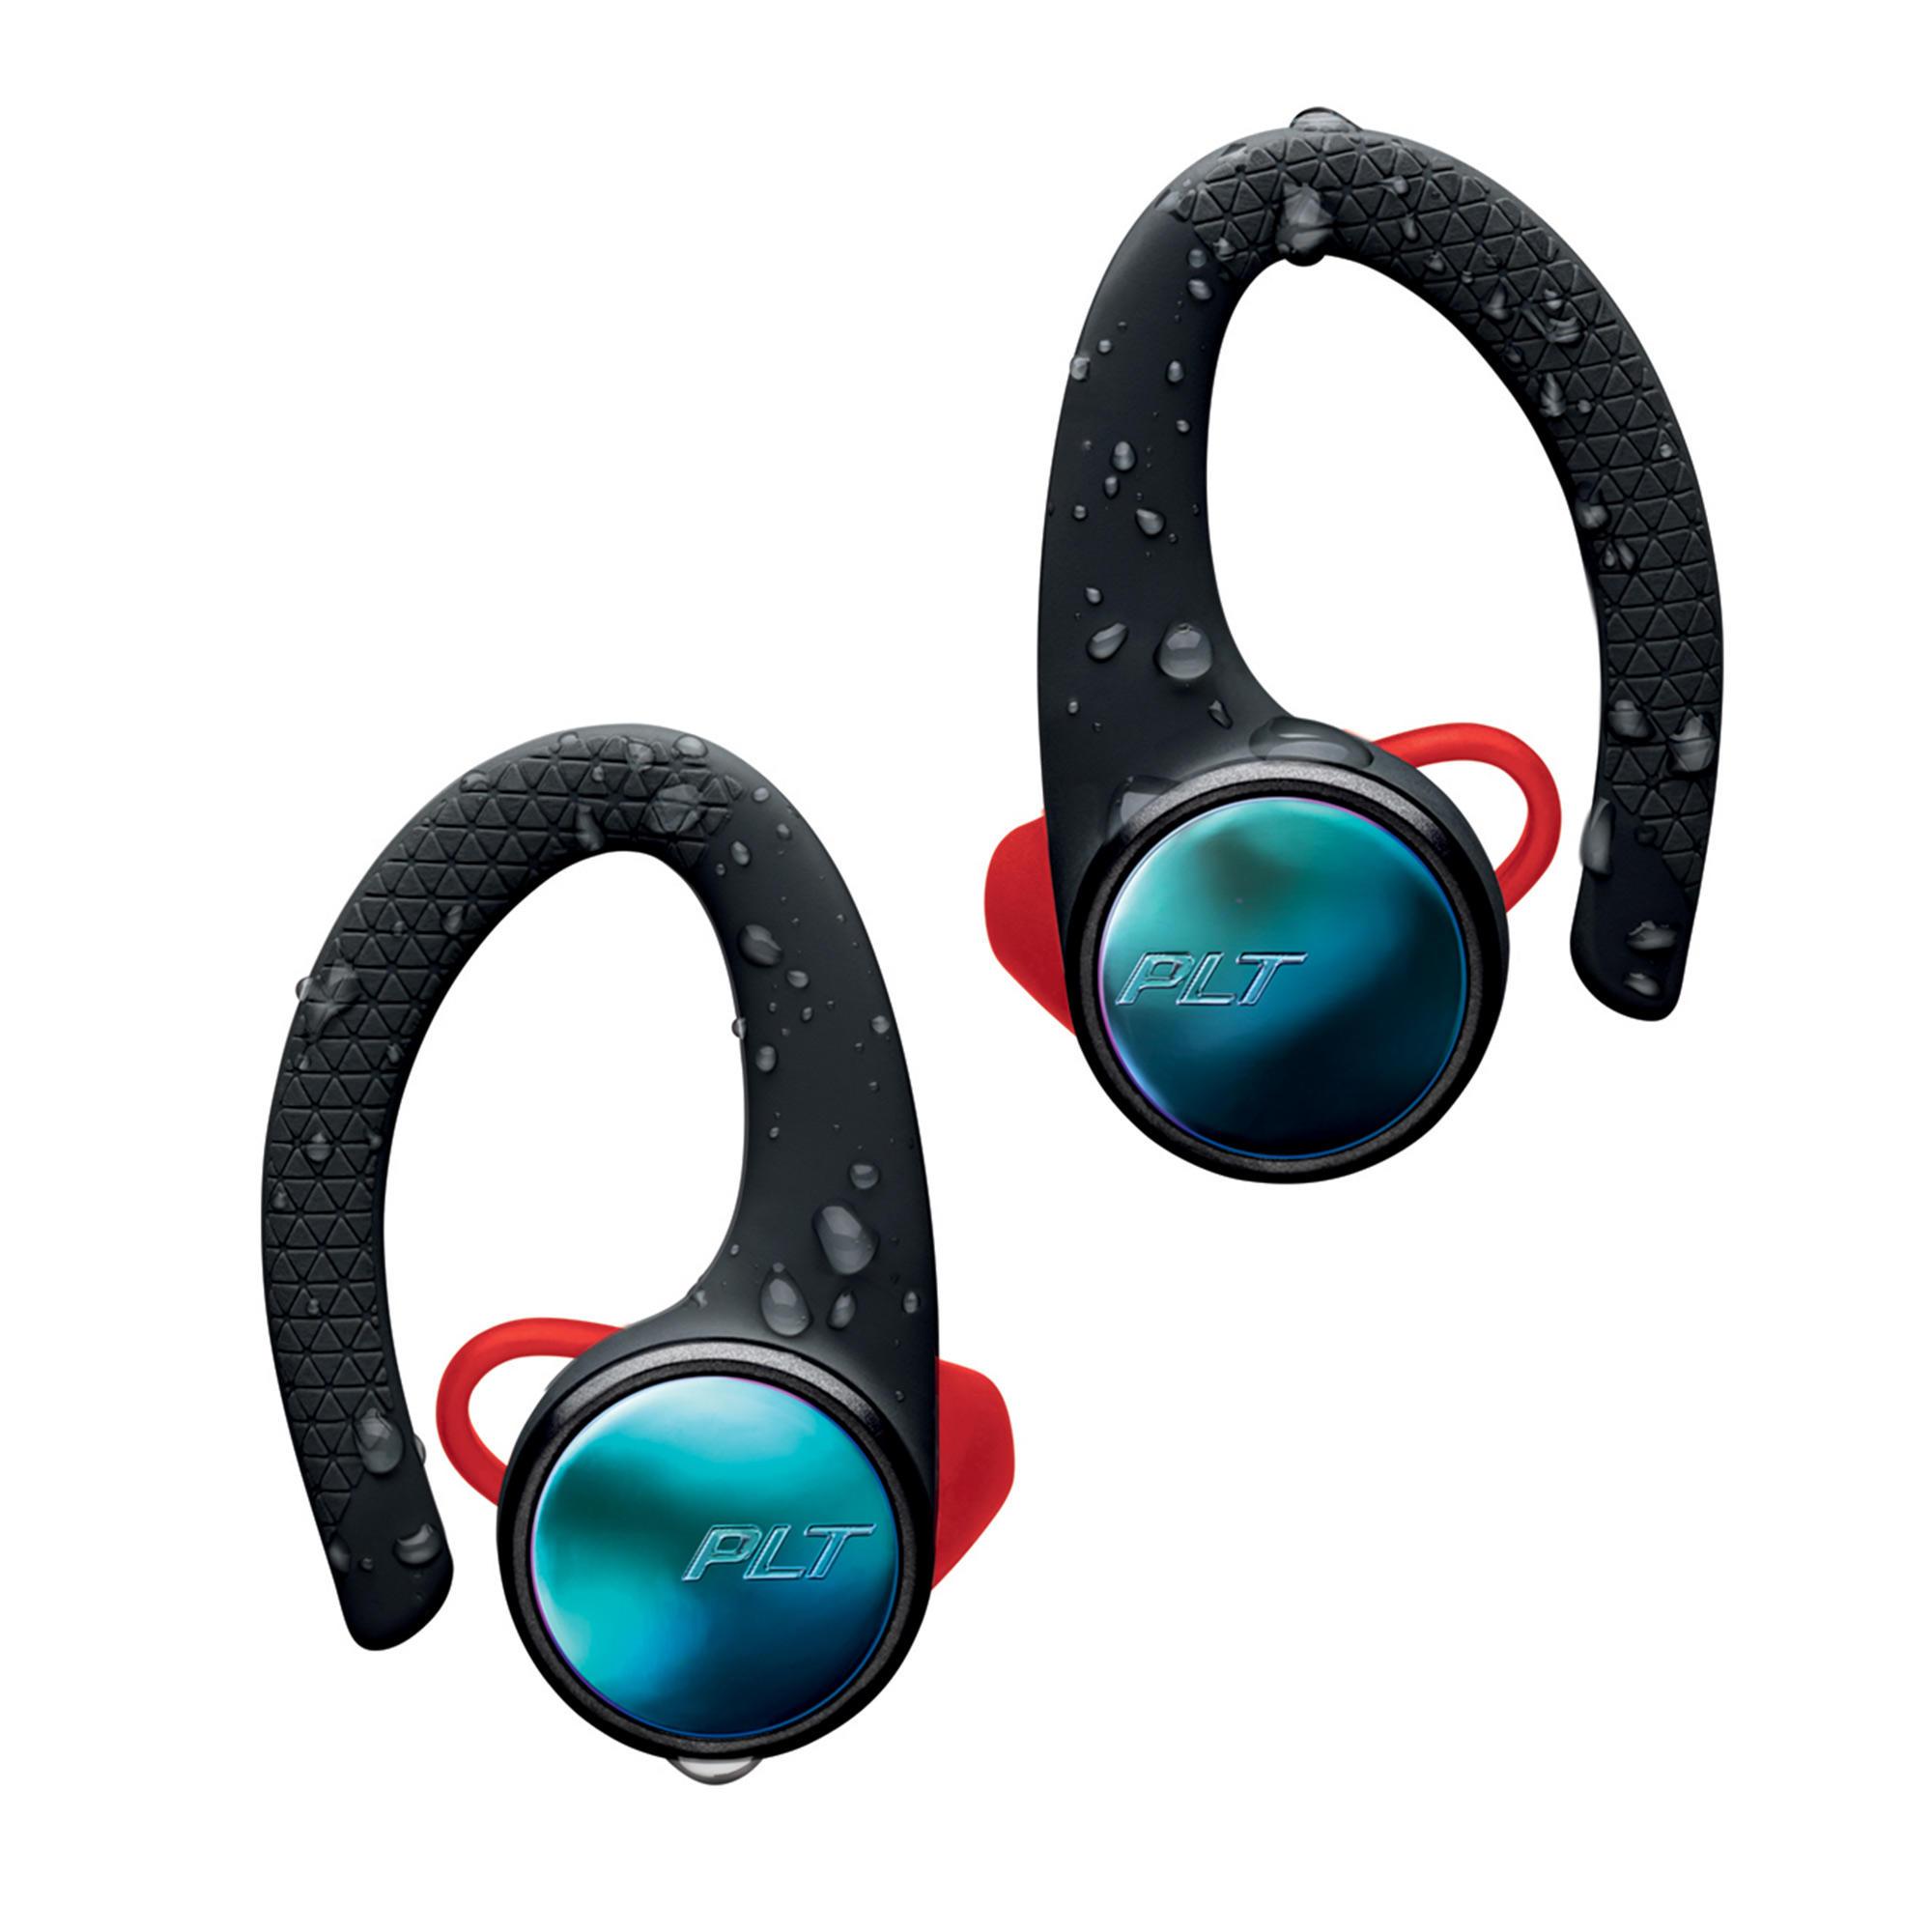 Sportkopfhörer Bluetooth Backbeat Fit 3100 + Ladeetui inkl.